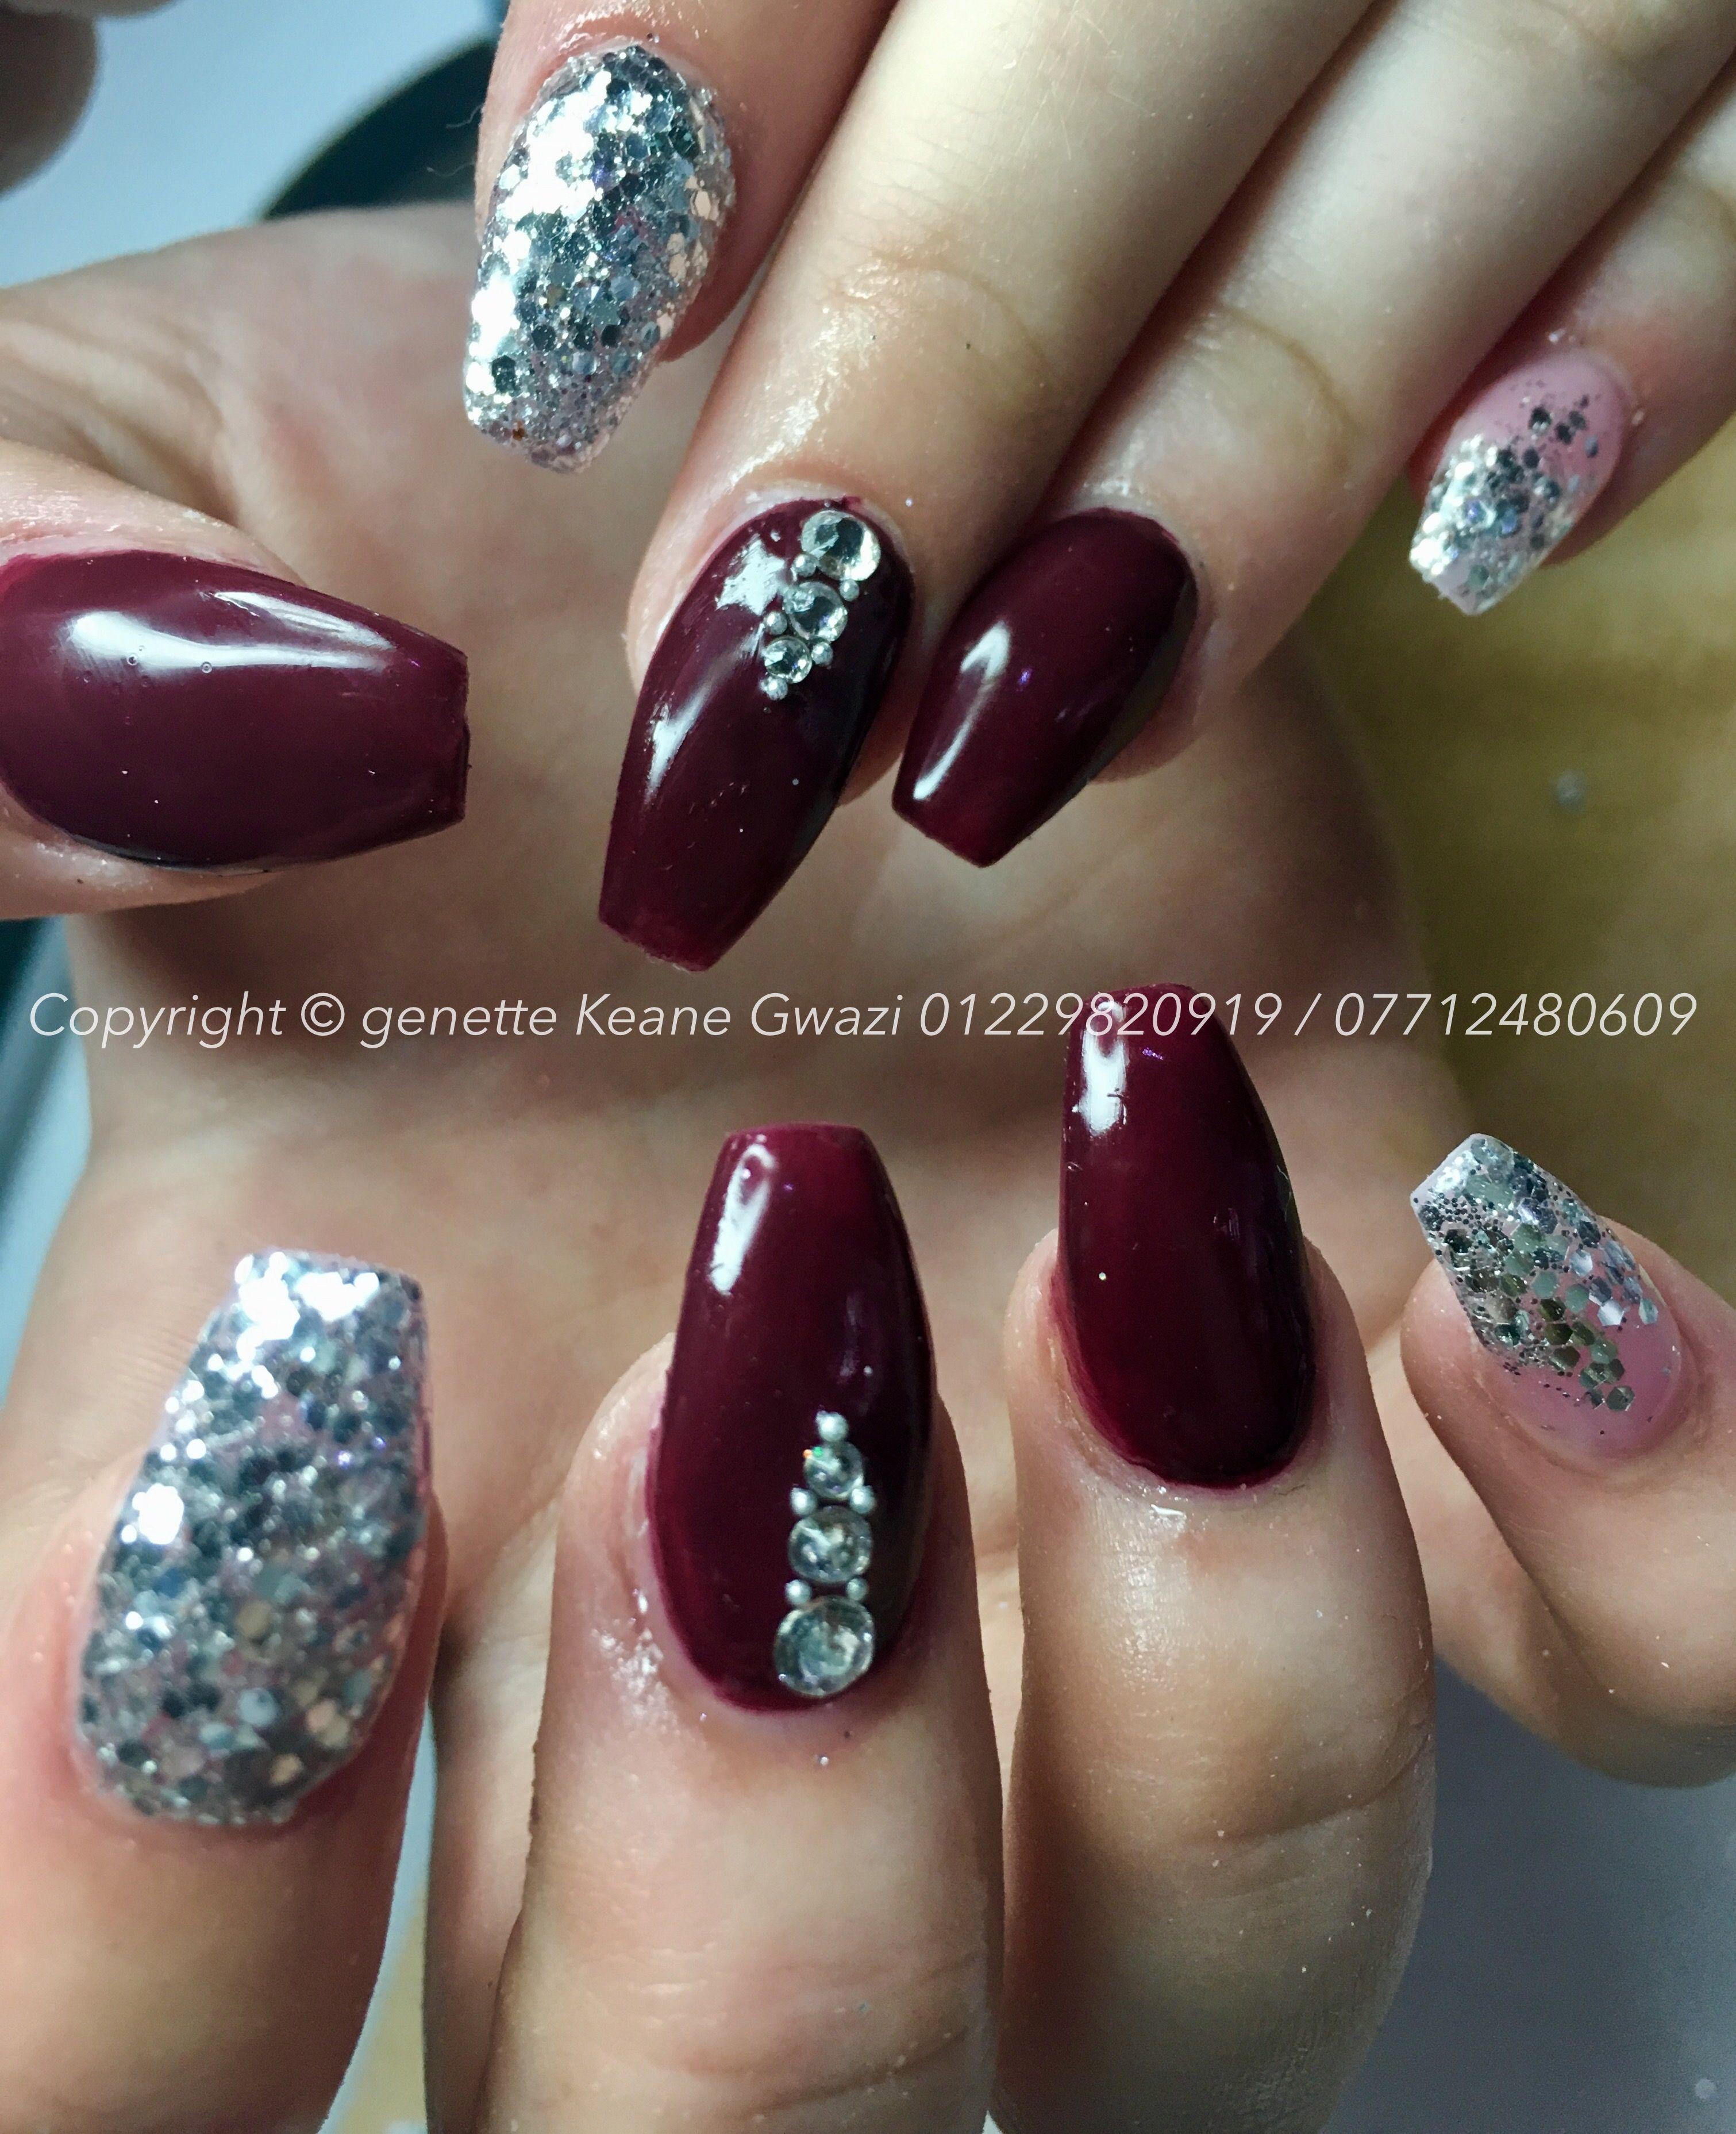 Acrylic Nails With Burgundy Gel Polish Silver Chunky Glitter Swarovski Crystal Nail Art Prom Nails Silver Prom Nail Designs Acrylic Nails